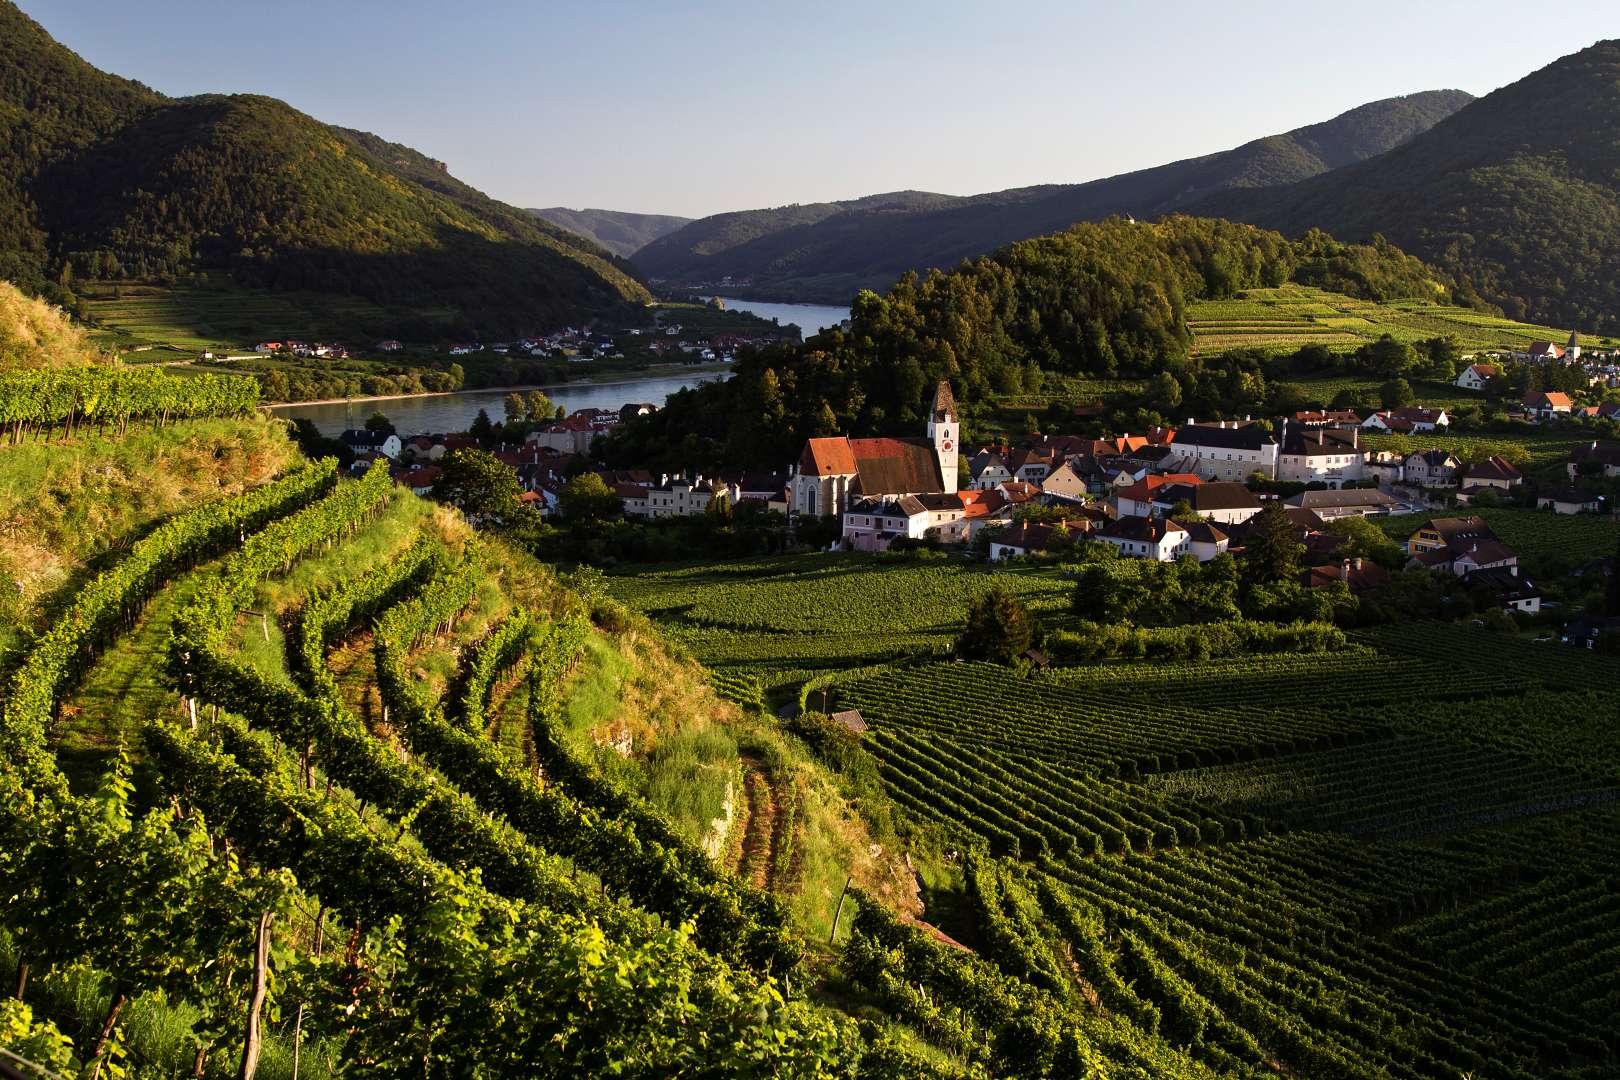 Wachau: Výhled na Spitz z vinice Singerriedel u Rotes Tor